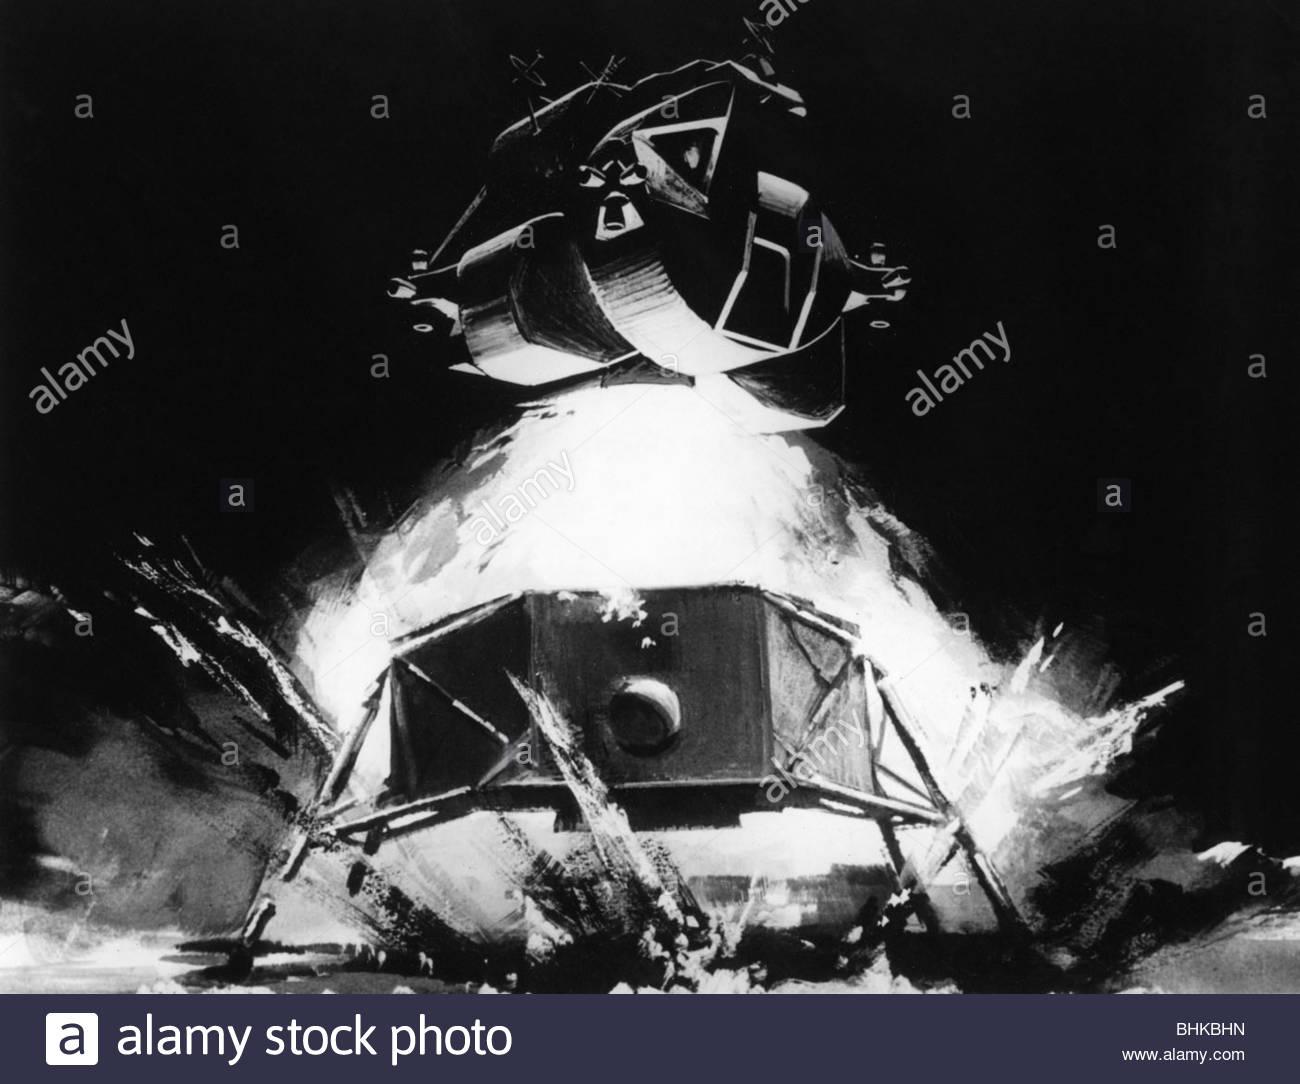 drawing apollo 11 moon lander - photo #24